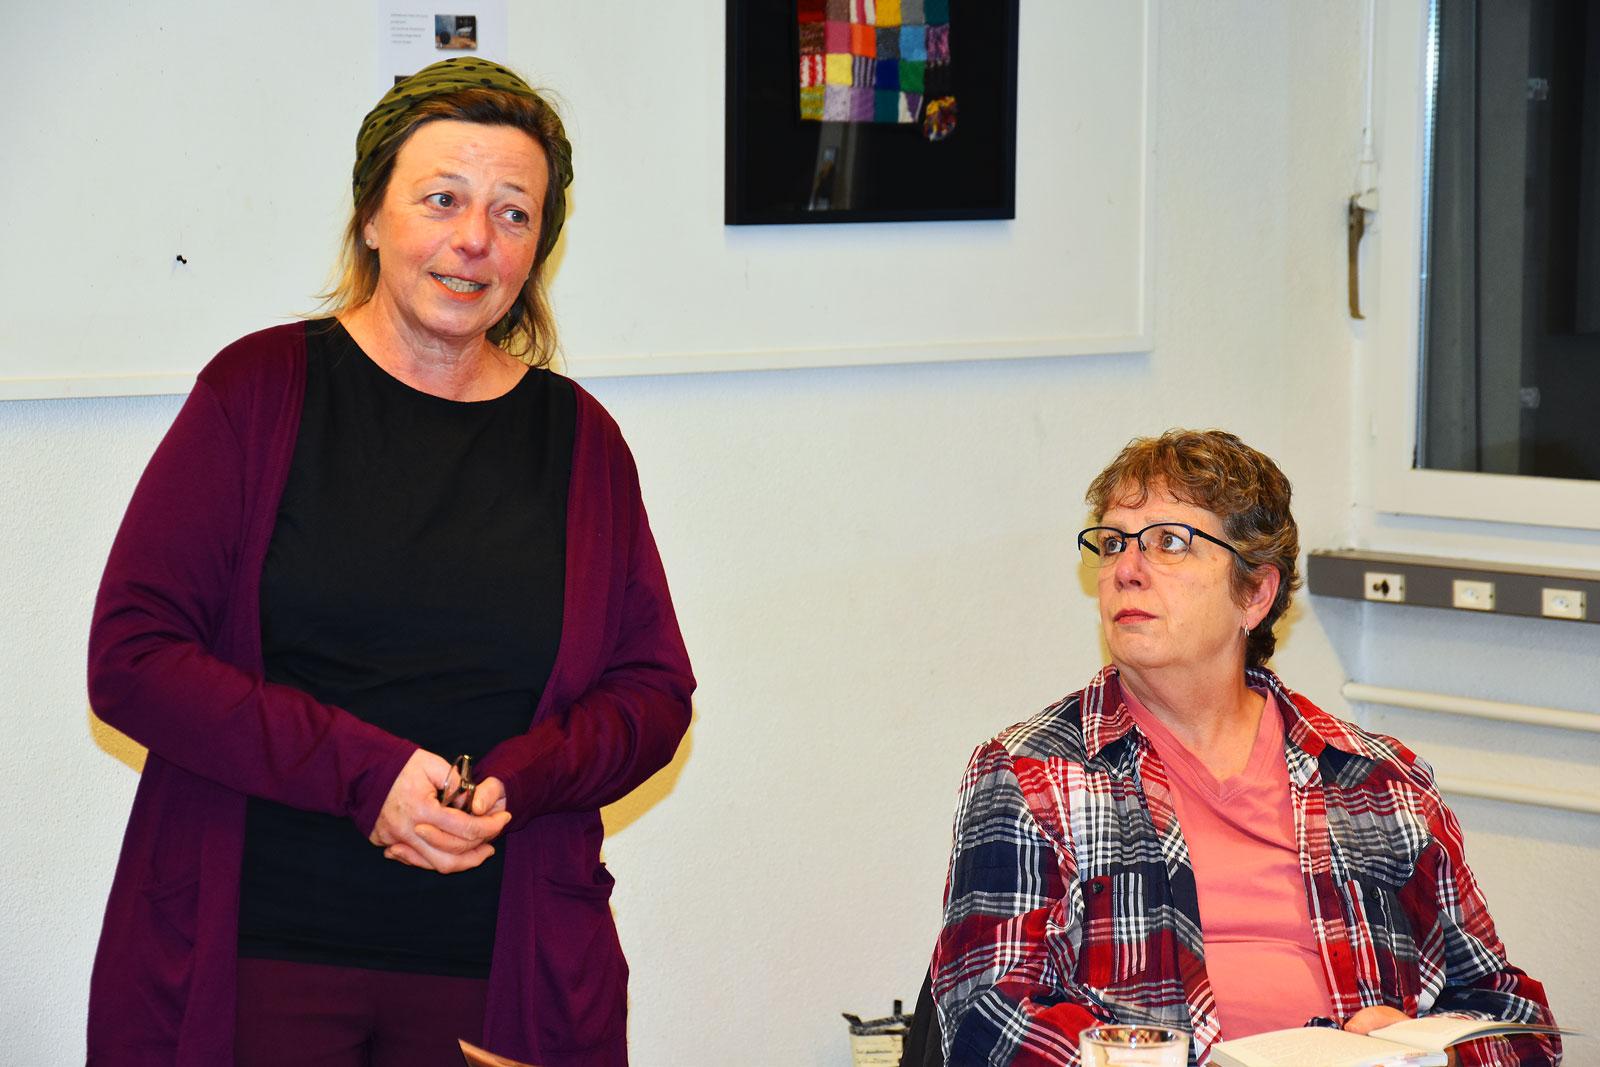 Buchtipp No 8 - Daniela Ait Salem - Bibliothek Huttwil